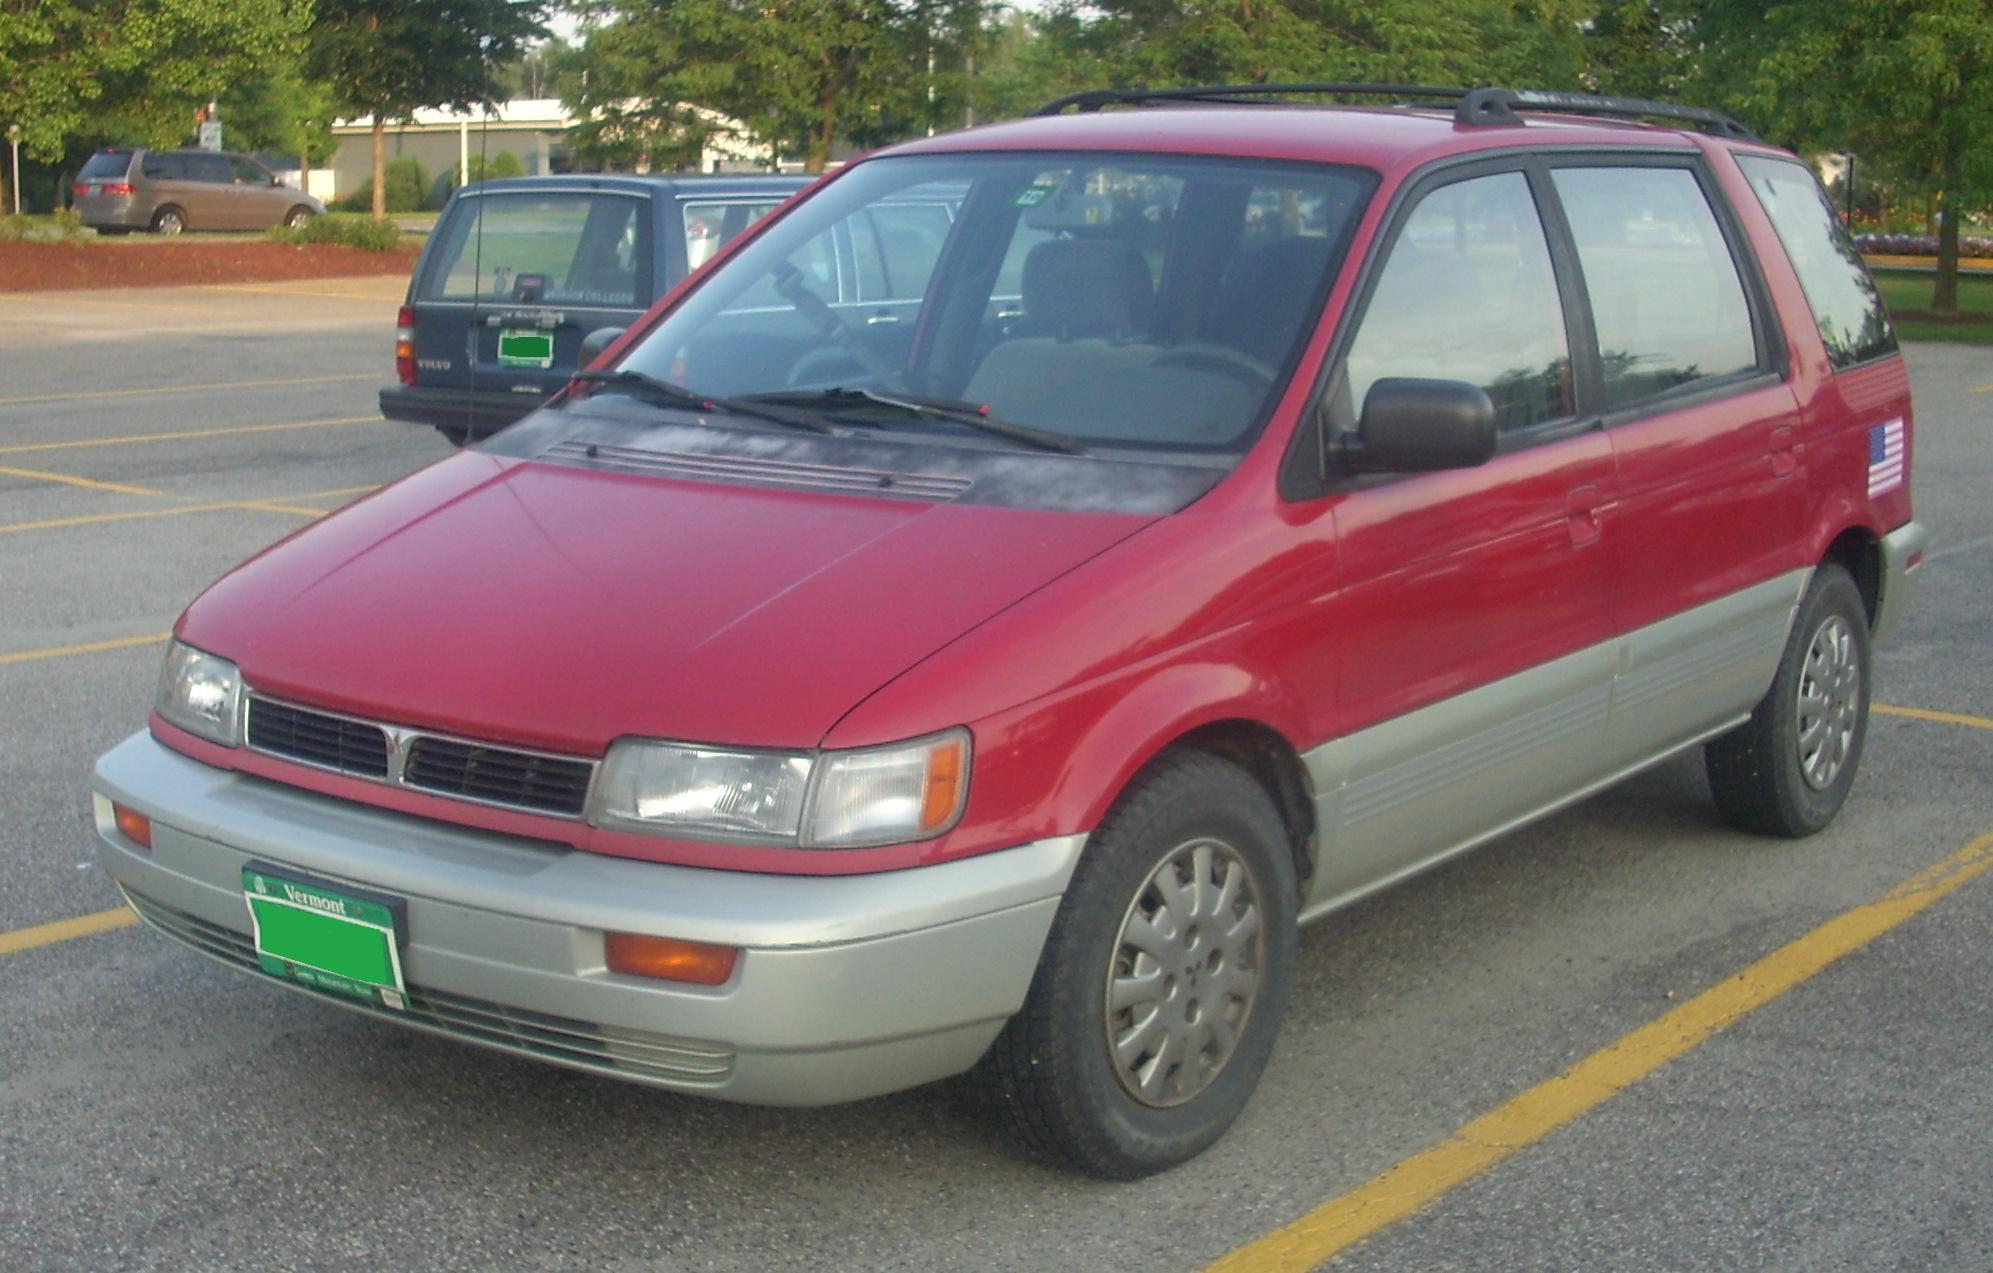 1992 mitsubishi expo sp 4dr hatchback 2 4l 4x4 manual rh carspecs us 1991 Mitsubishi Expo Recalls 1994 Mitsubishi Expo